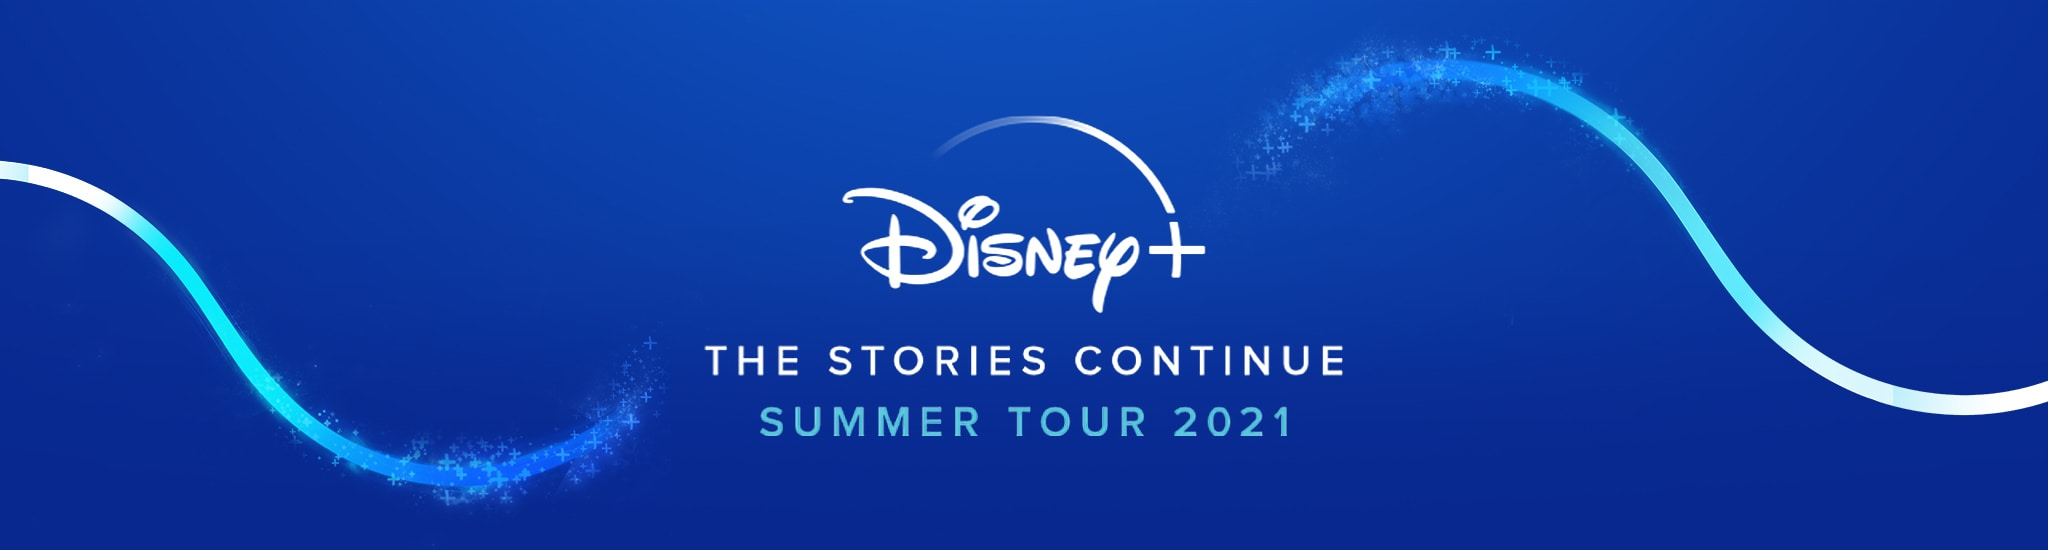 Disney+ | The Stories Continue | Summer Tour 2021